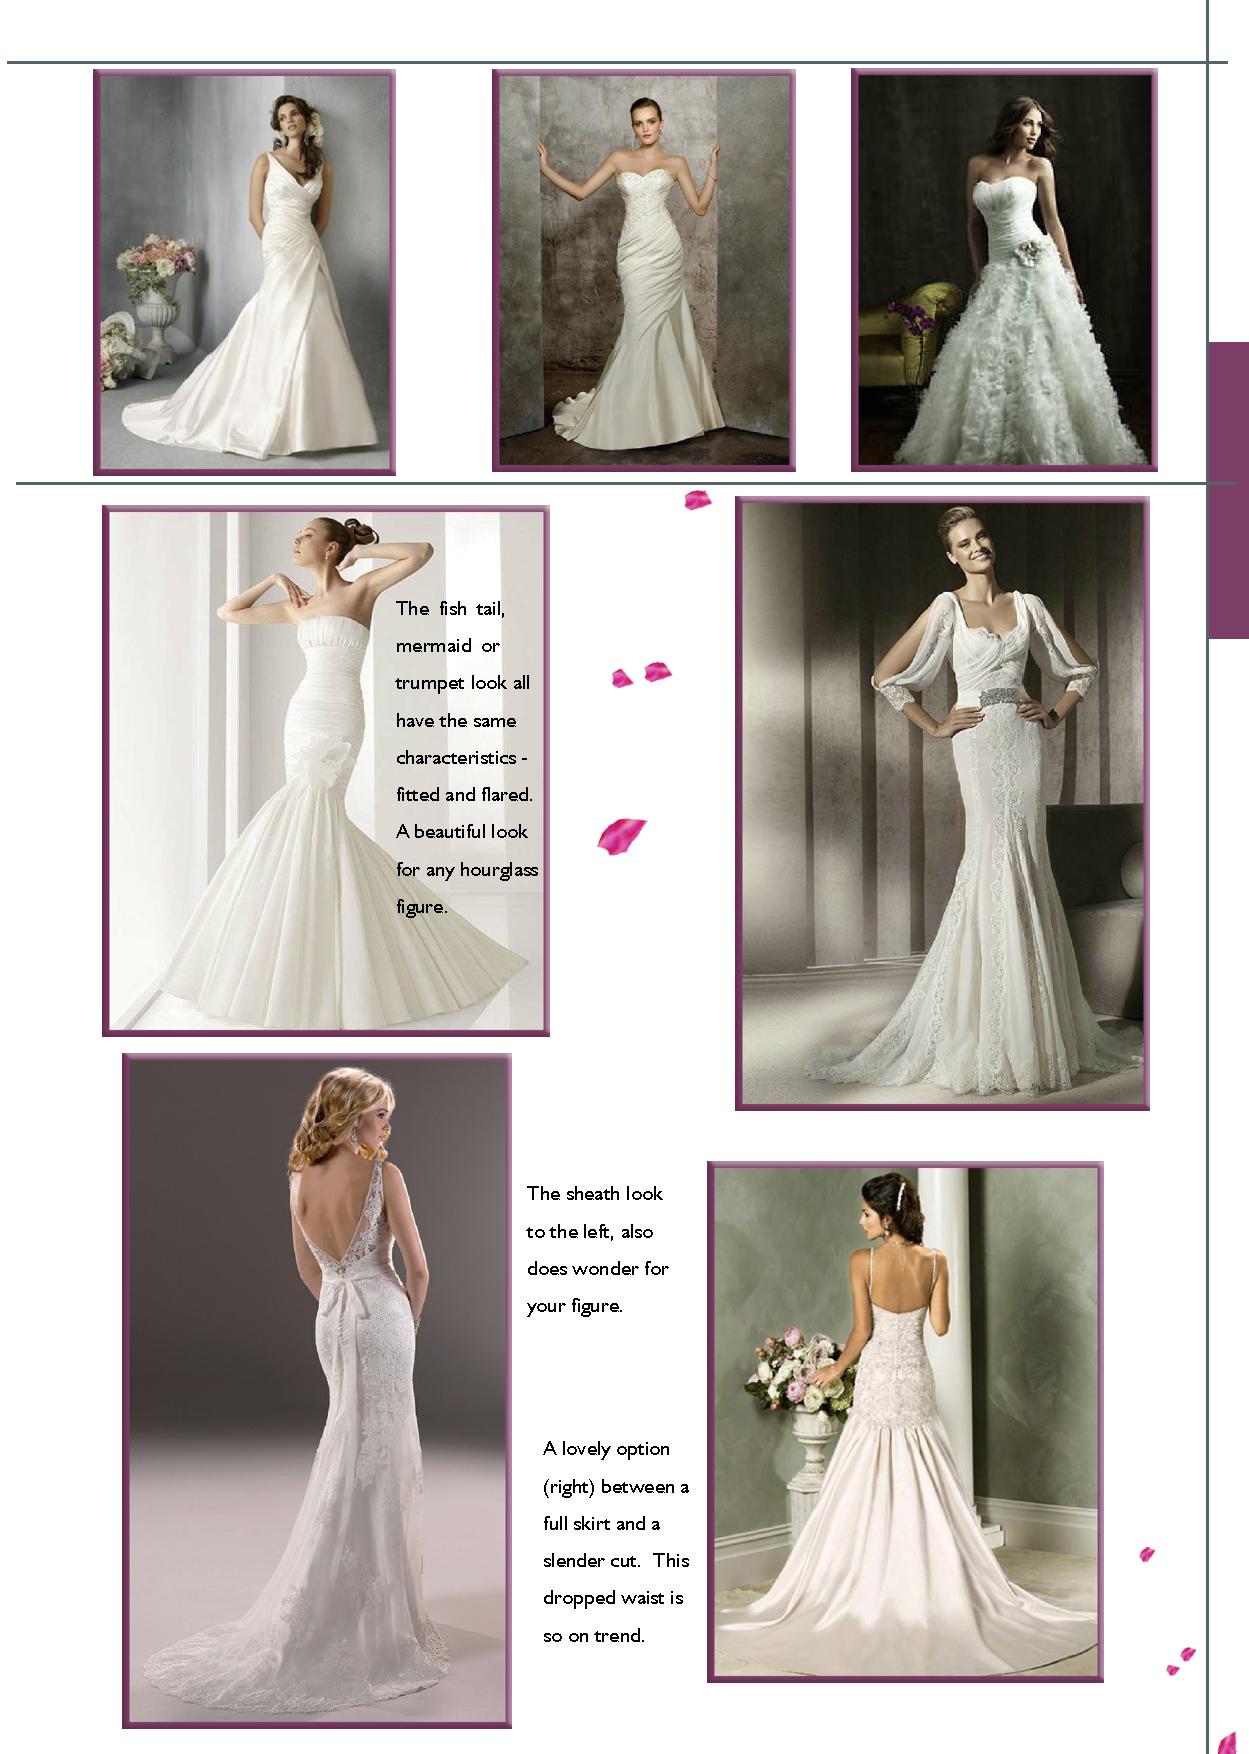 Sophia Hourgl Body Shape Bridal Gown Suggestions Weddingdaystyle Weddinggowns Weddings Styleguide